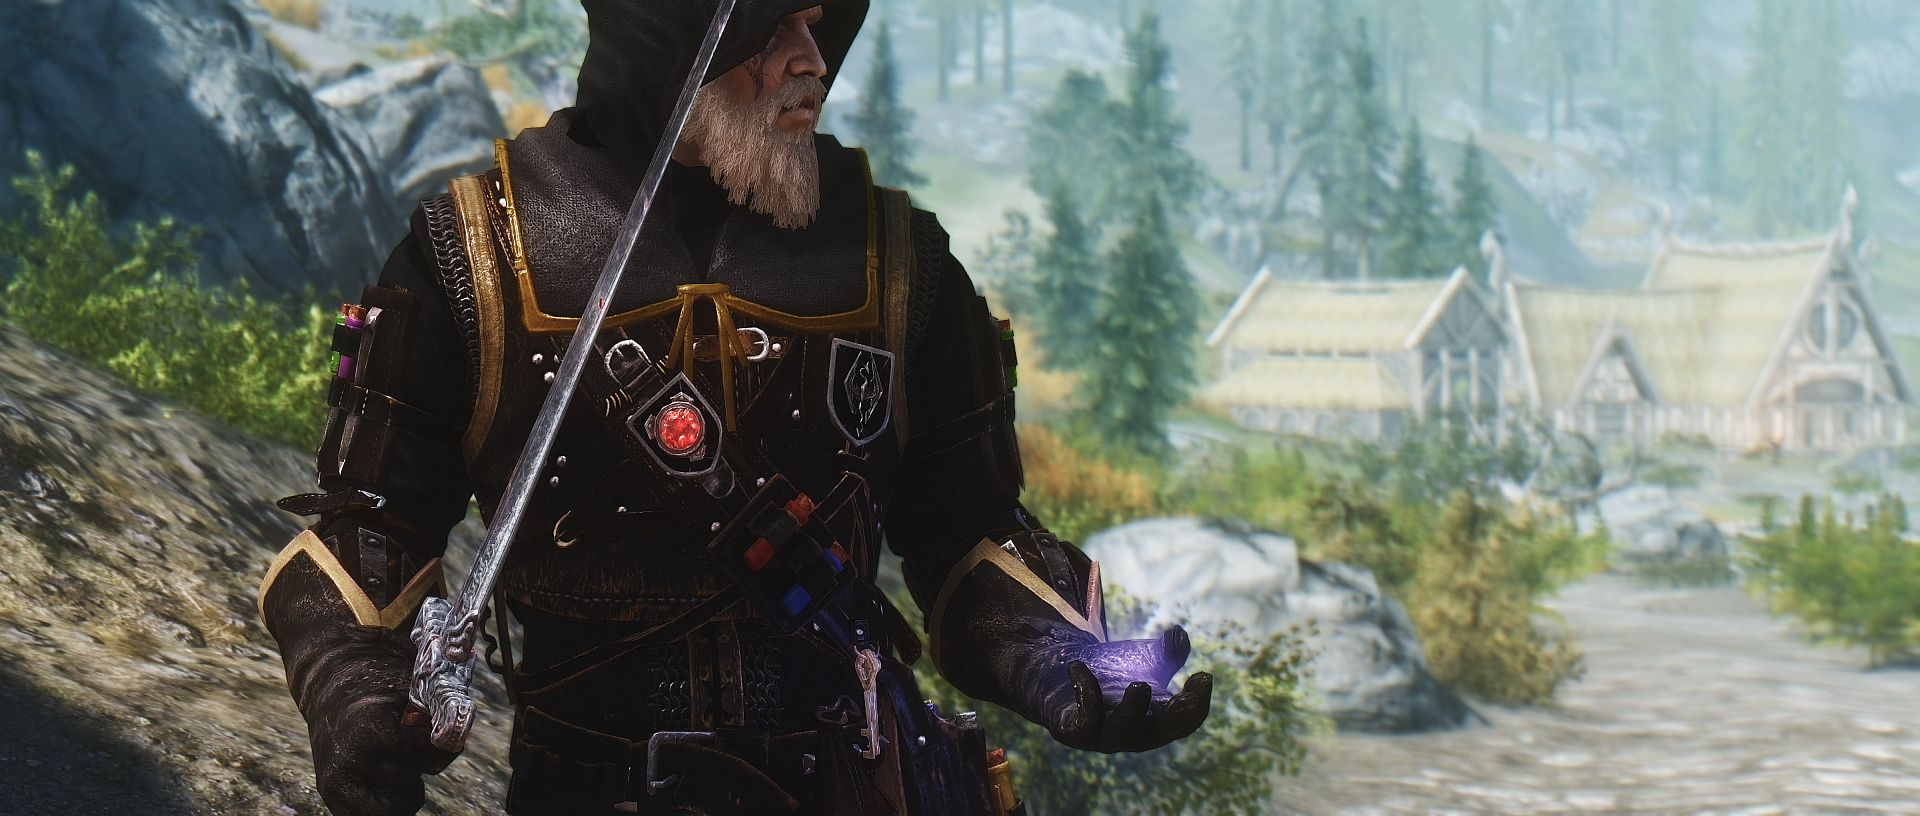 skyrim immersive armor list